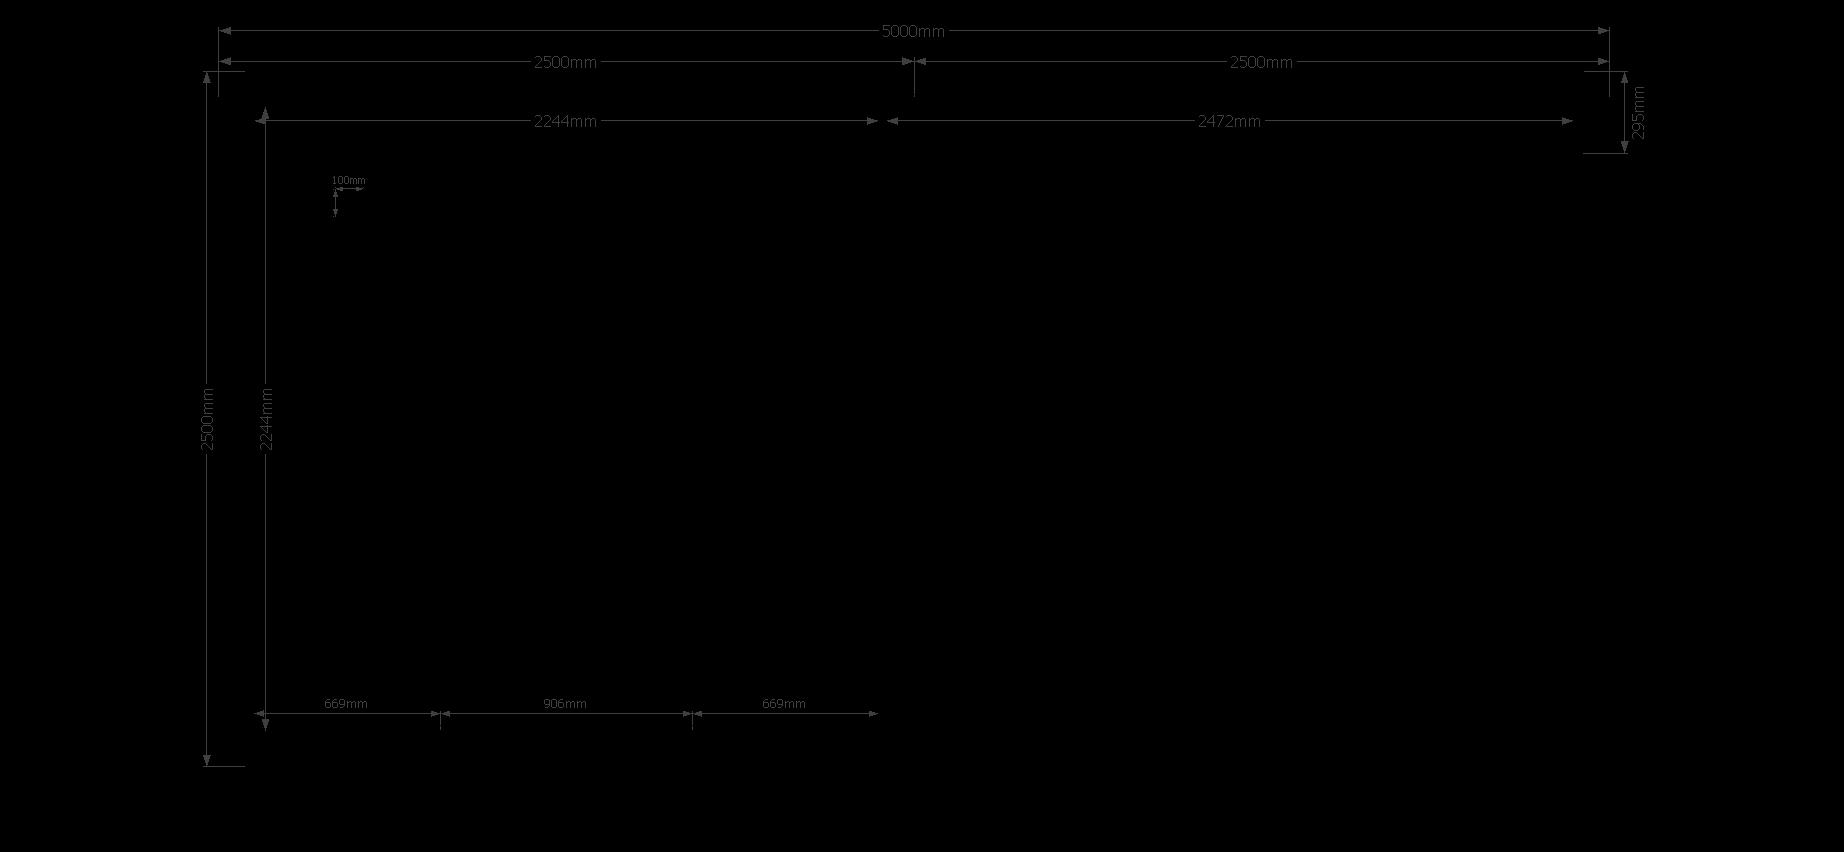 DWF Blokhut met overkapping plat dak 400 x 200 + 400cm